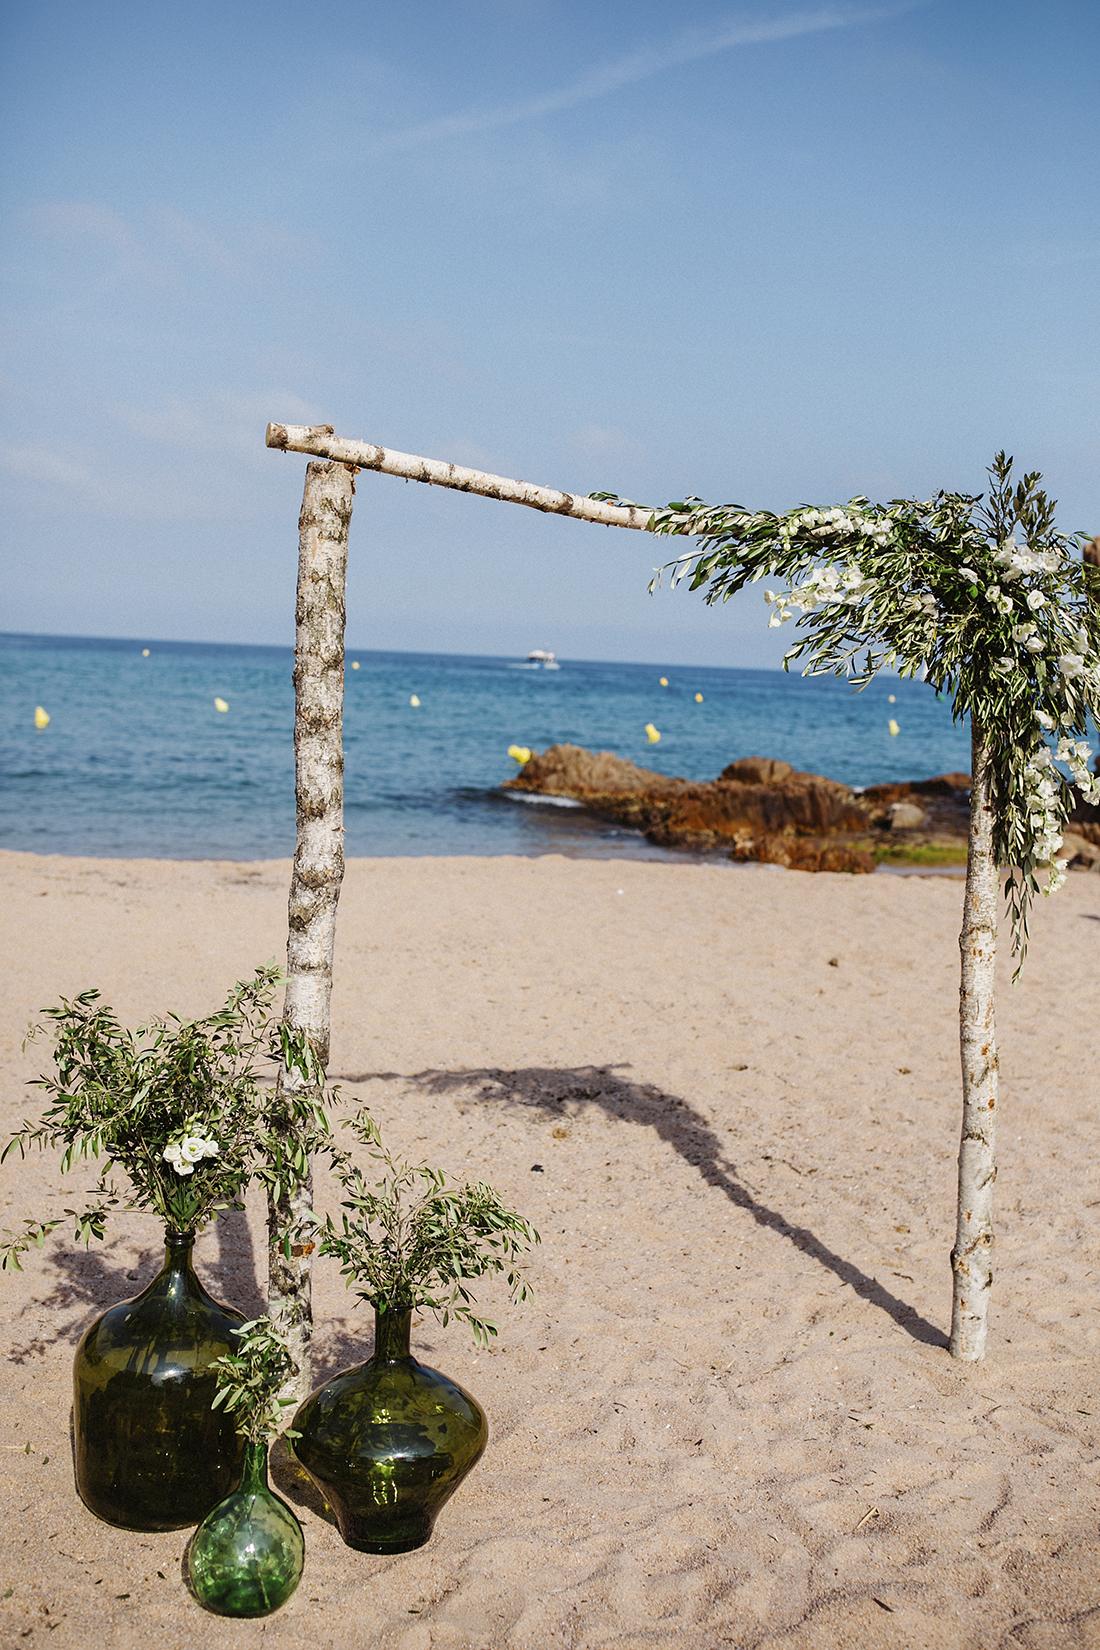 boda Costa Brava www.bodasdecuento.com